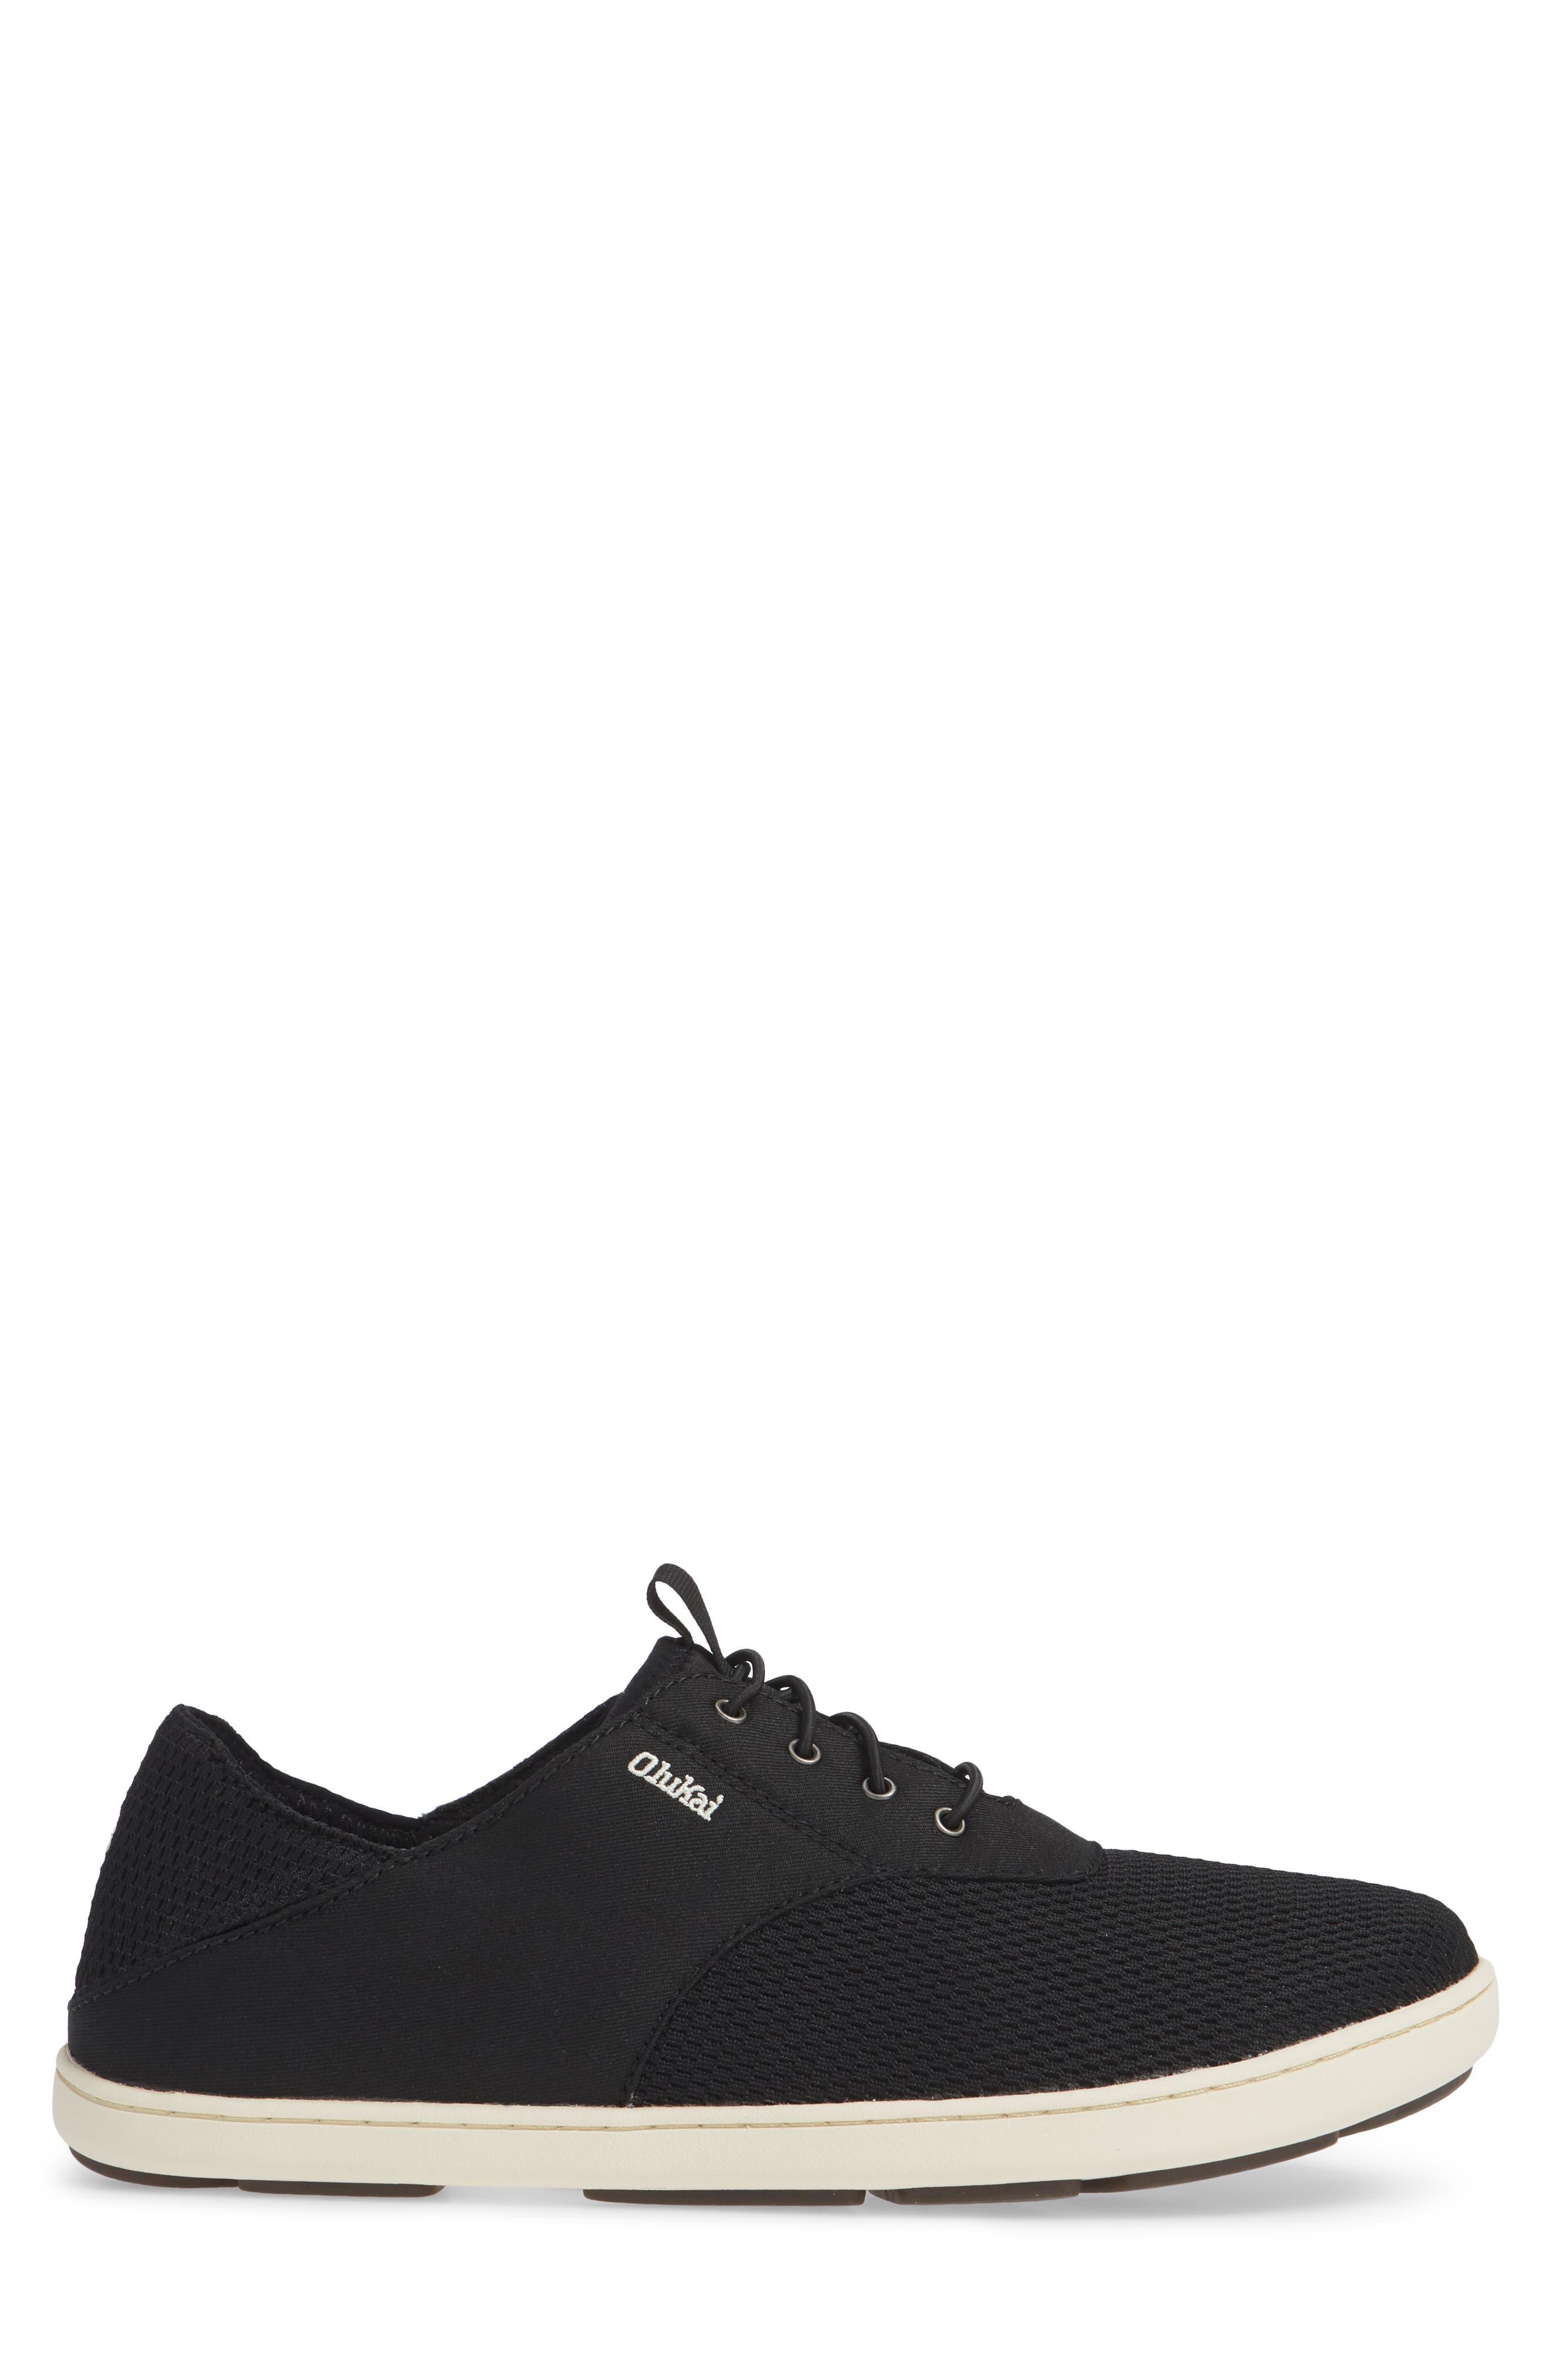 Nohea Moku Sneaker,                             Alternate thumbnail 3, color,                             ONYX/ ONYX TEXTILE